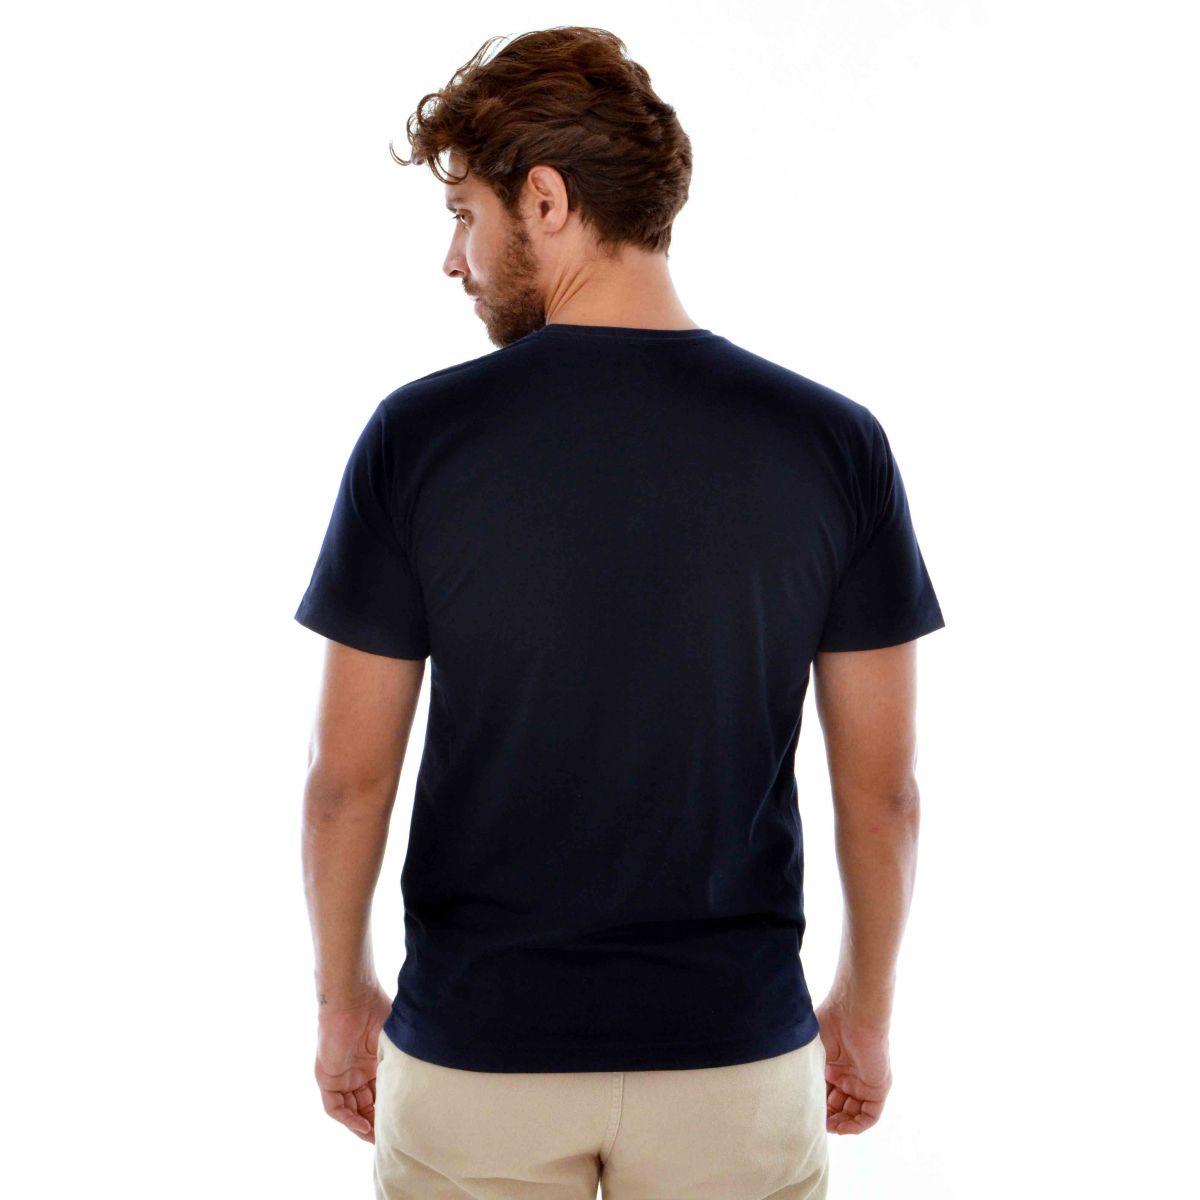 Camiseta Basic TH Preta  - Ca Brasileira